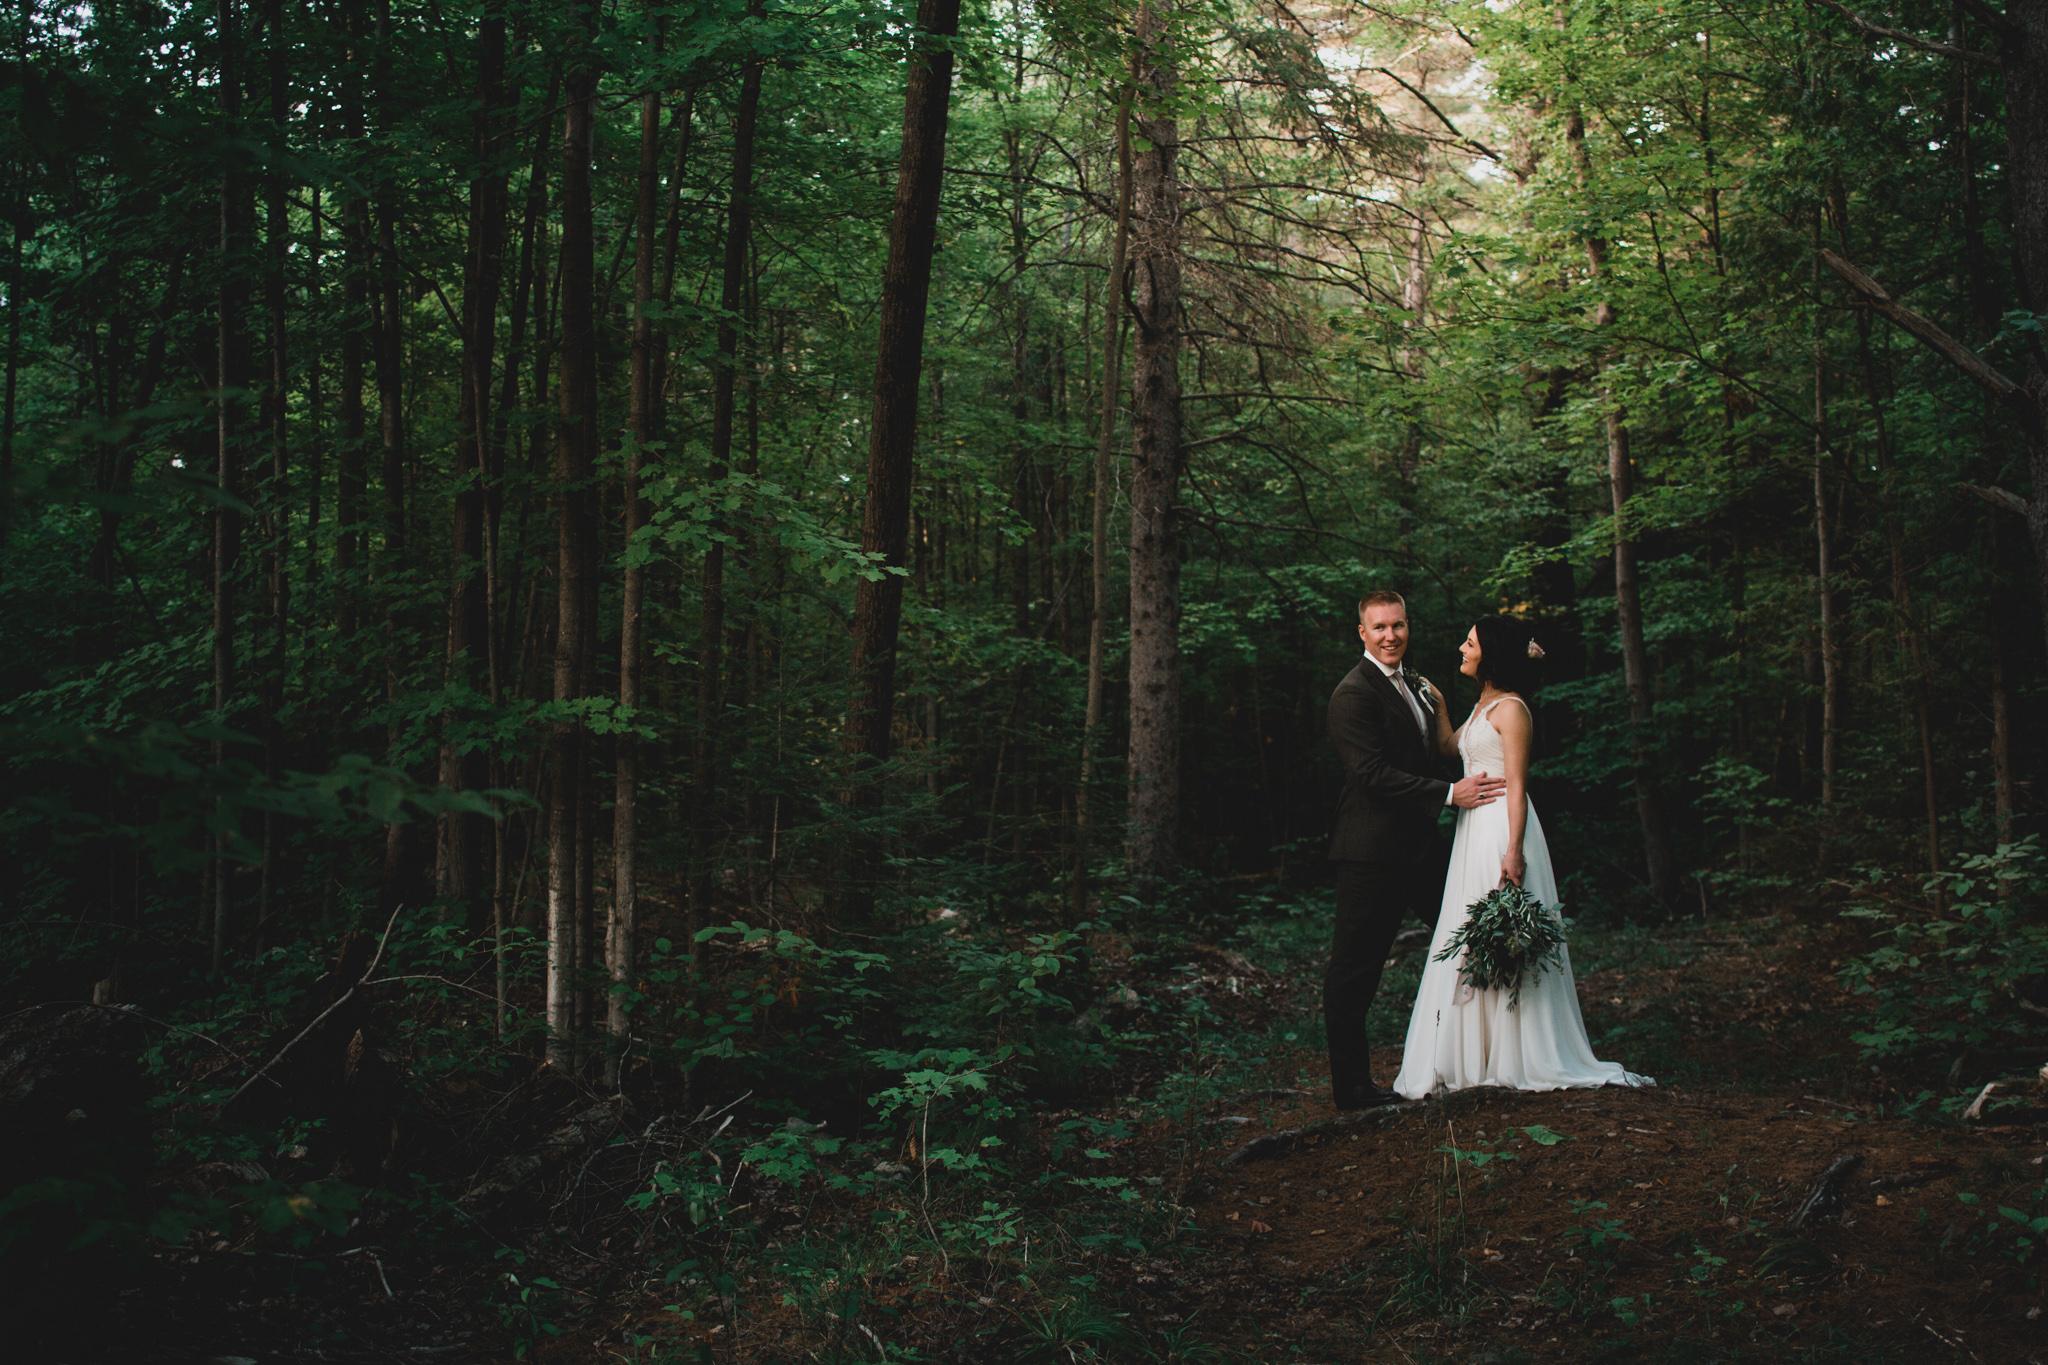 Natural, rustic wedding photography